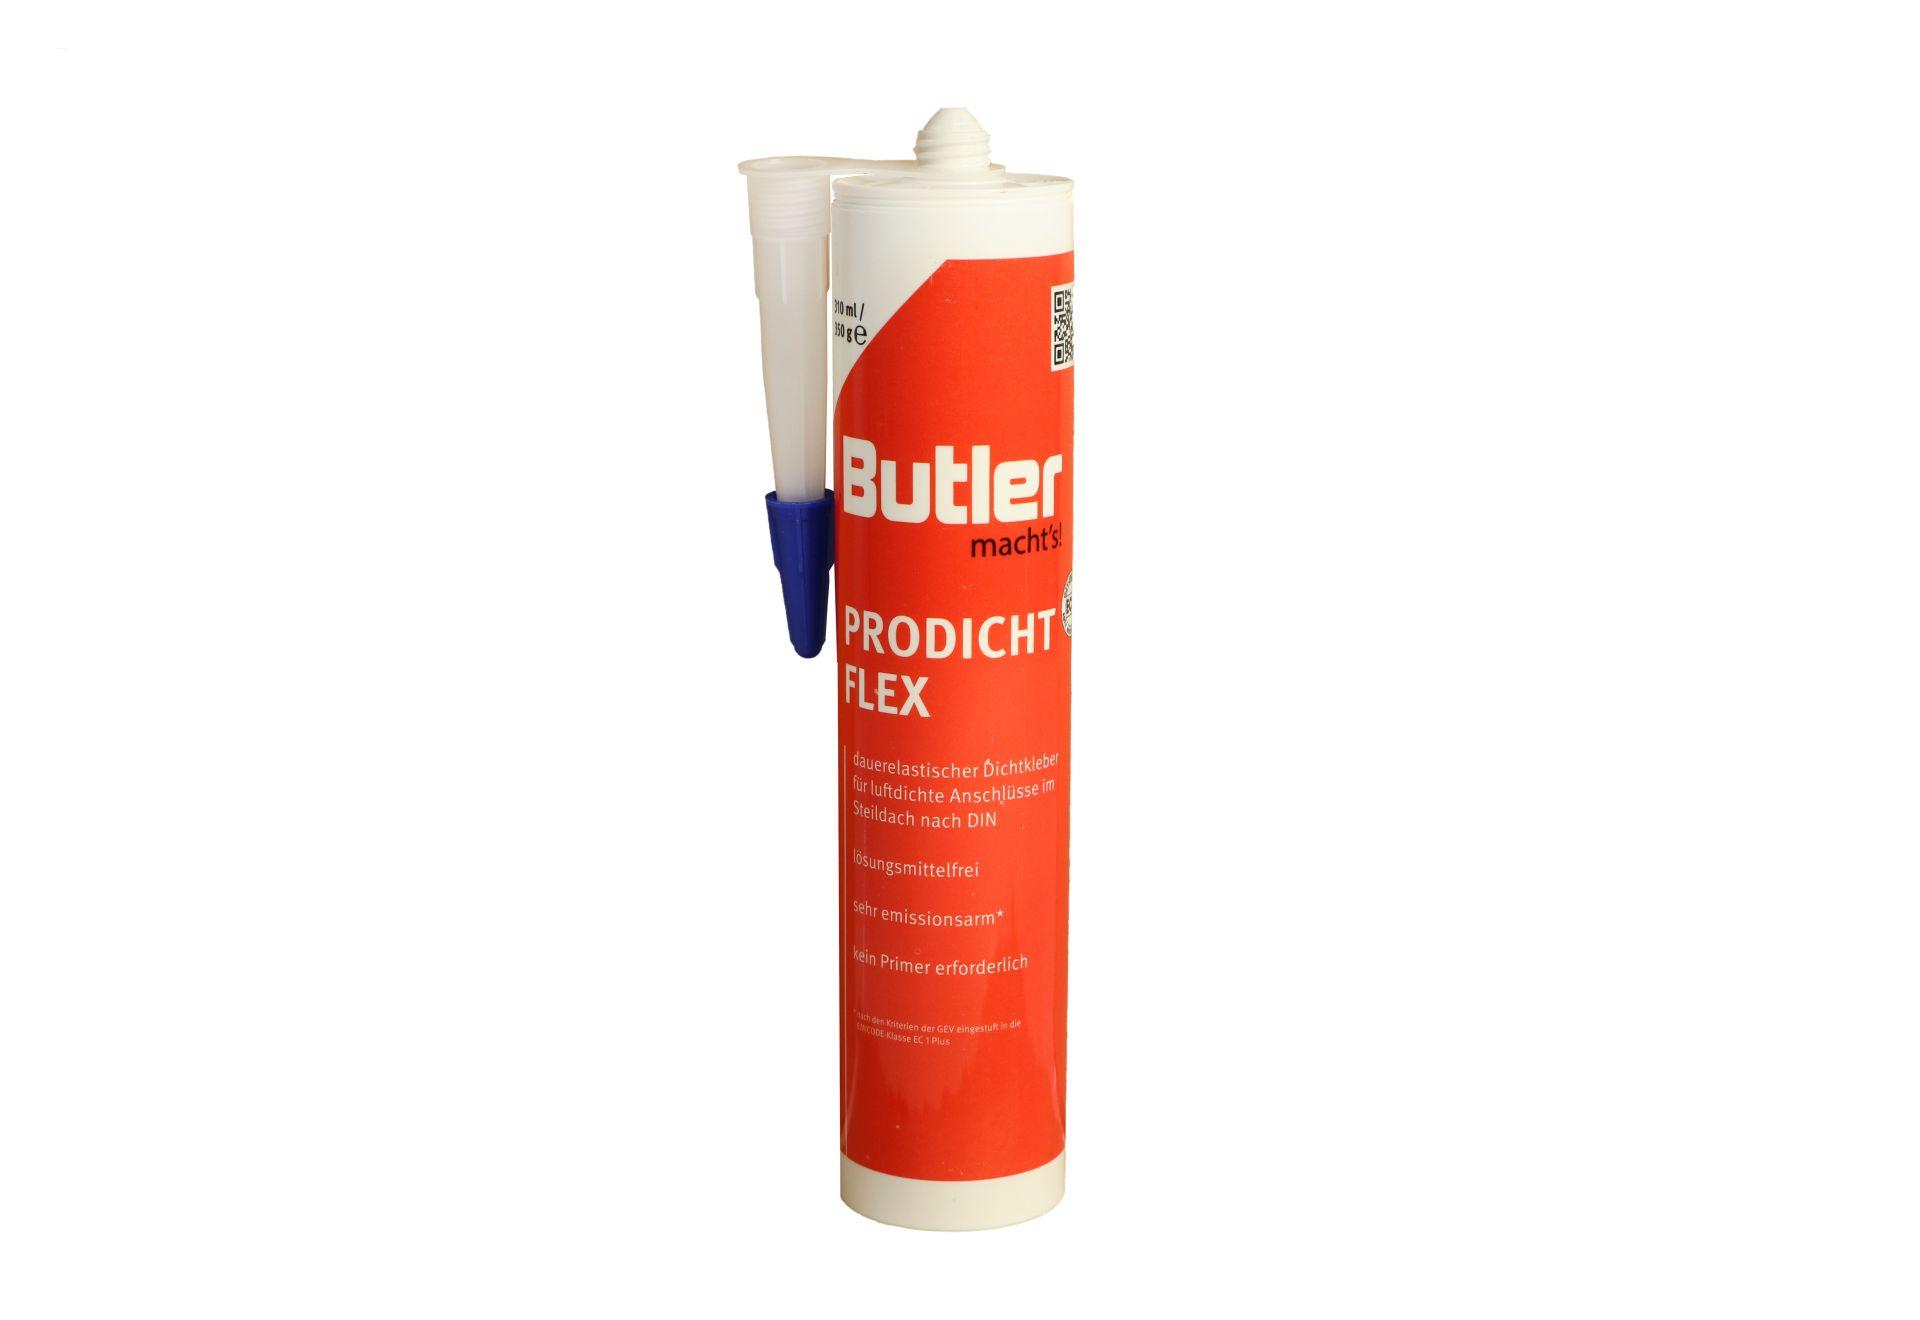 Butler macht's! ProDicht Flex, Foliendichtkleber, Dampfbremsenkleber, 310 ml